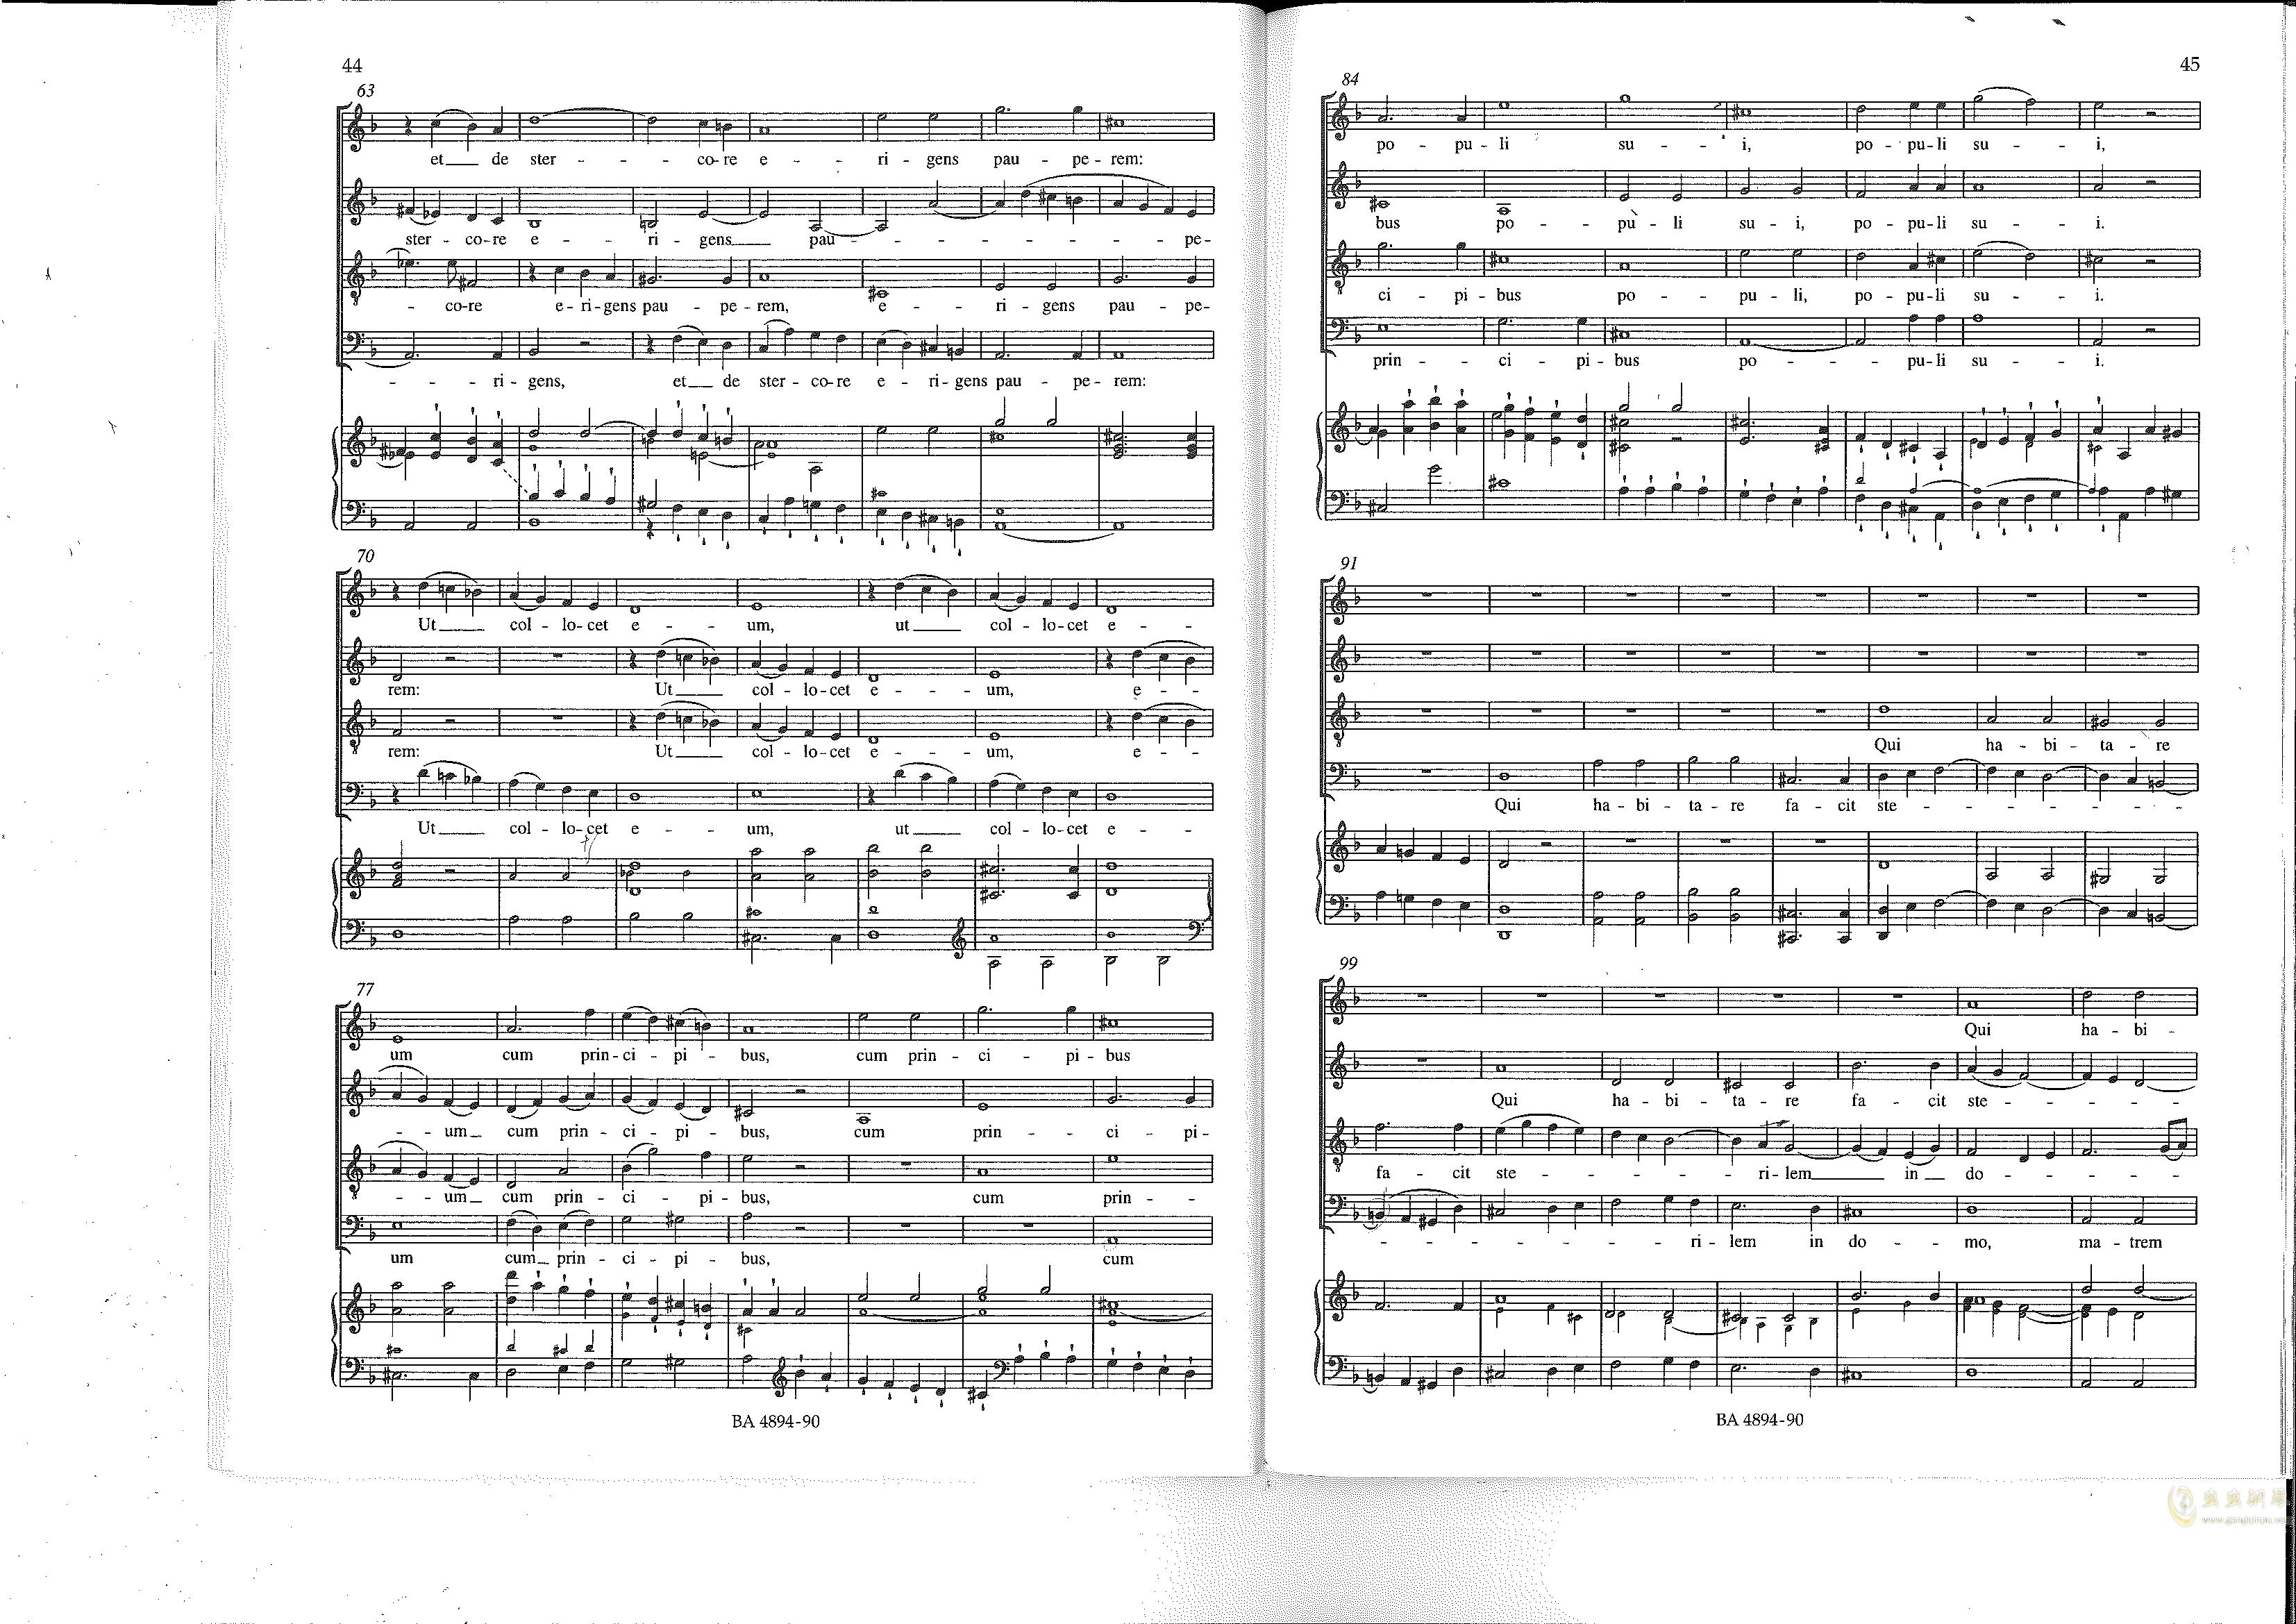 Vesperae solennes de confessore K. 339钢琴谱 第23页